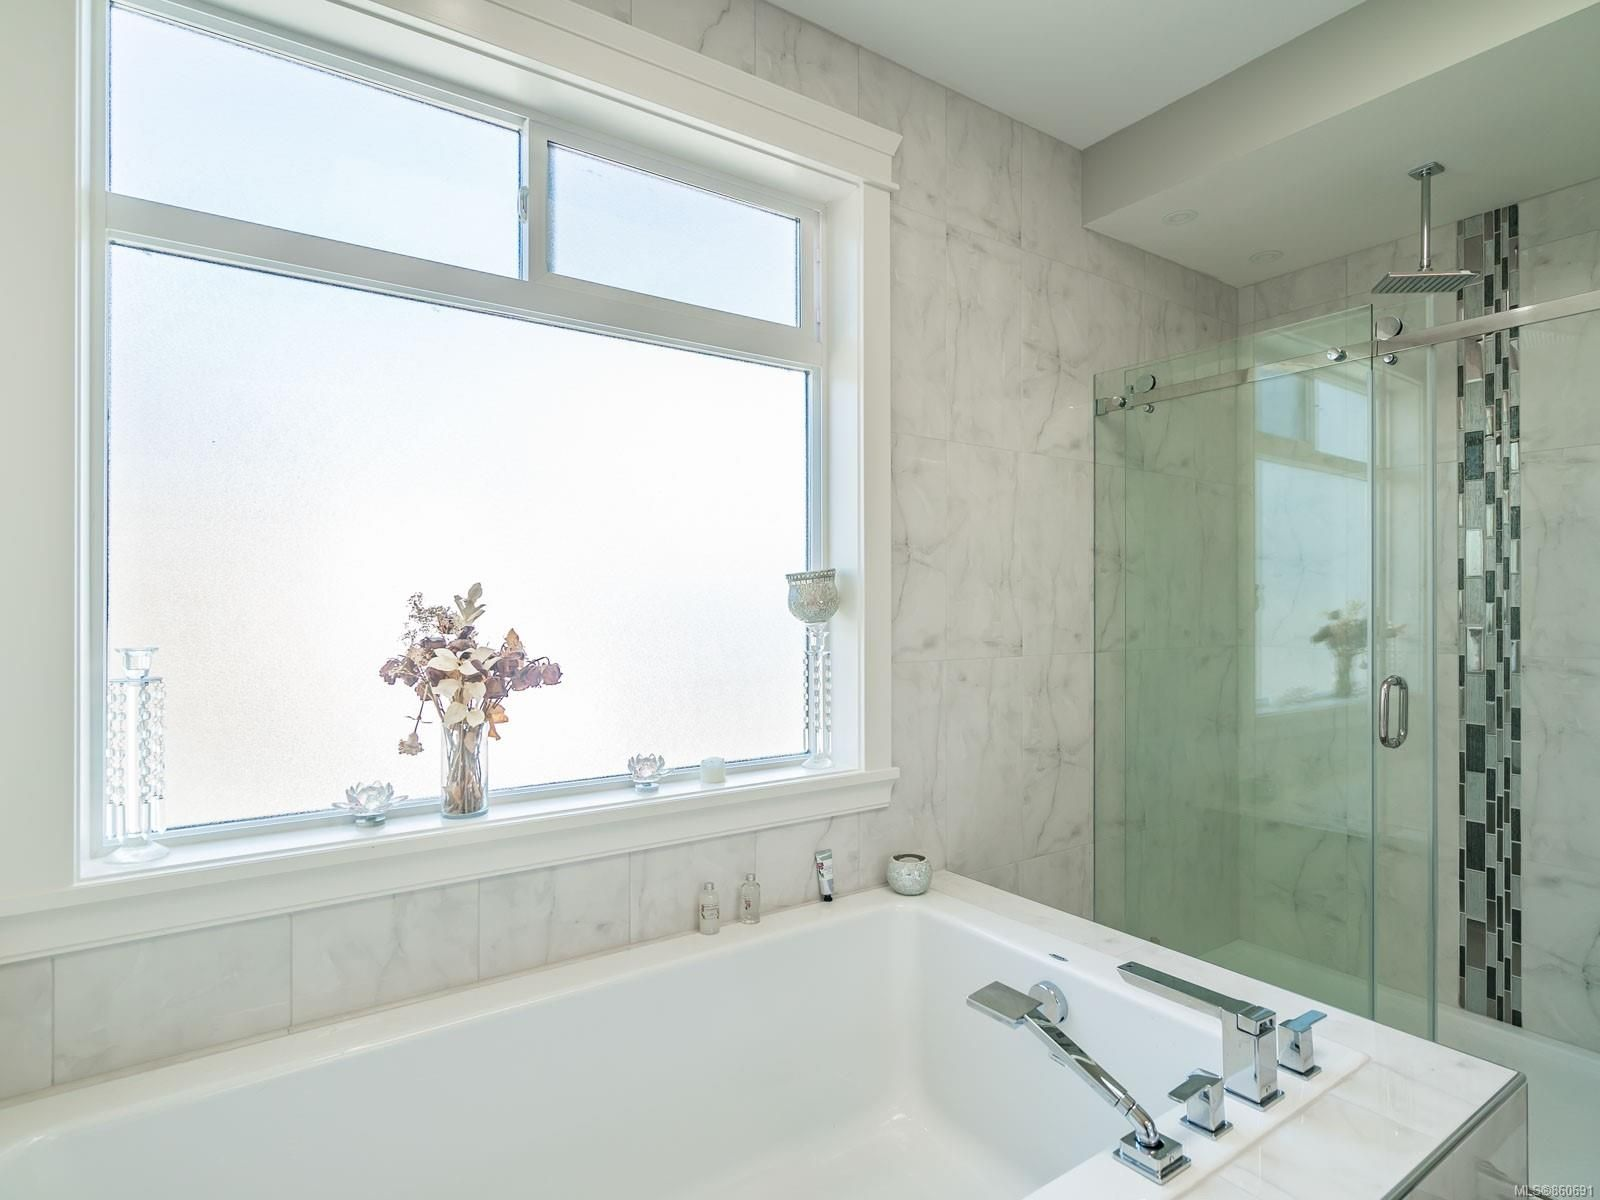 Photo 33: Photos: 5821 Linley Valley Dr in : Na North Nanaimo House for sale (Nanaimo)  : MLS®# 860691